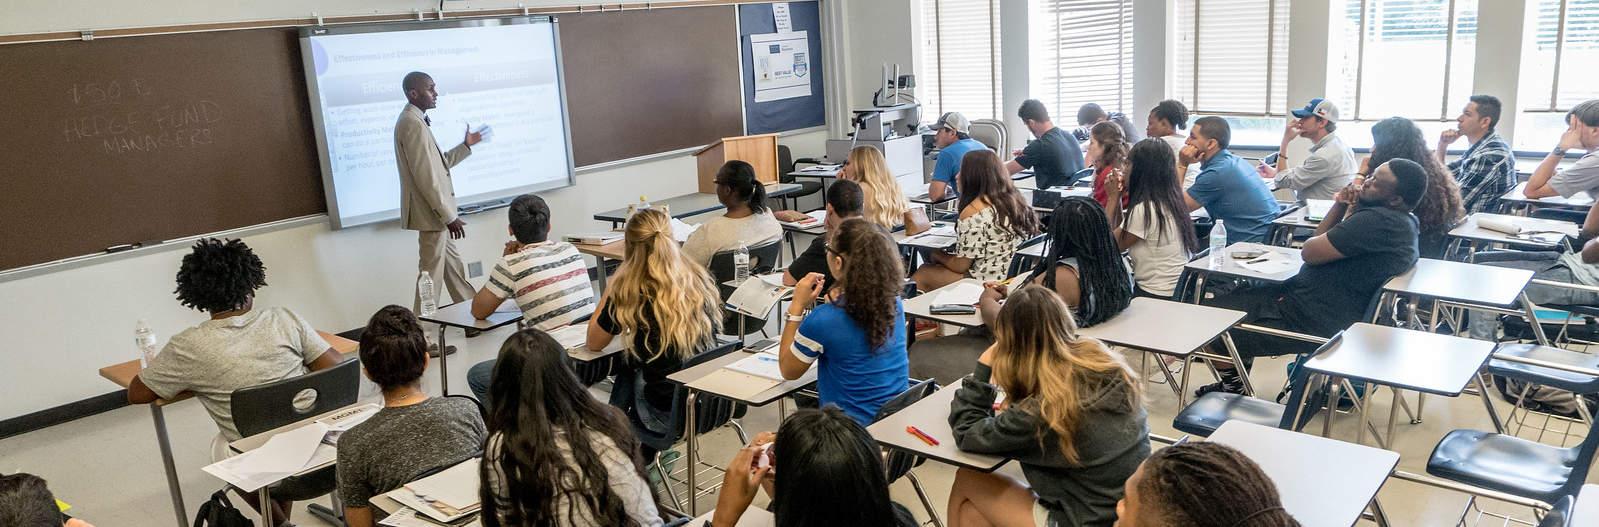 18001-Classroom-01756-X3